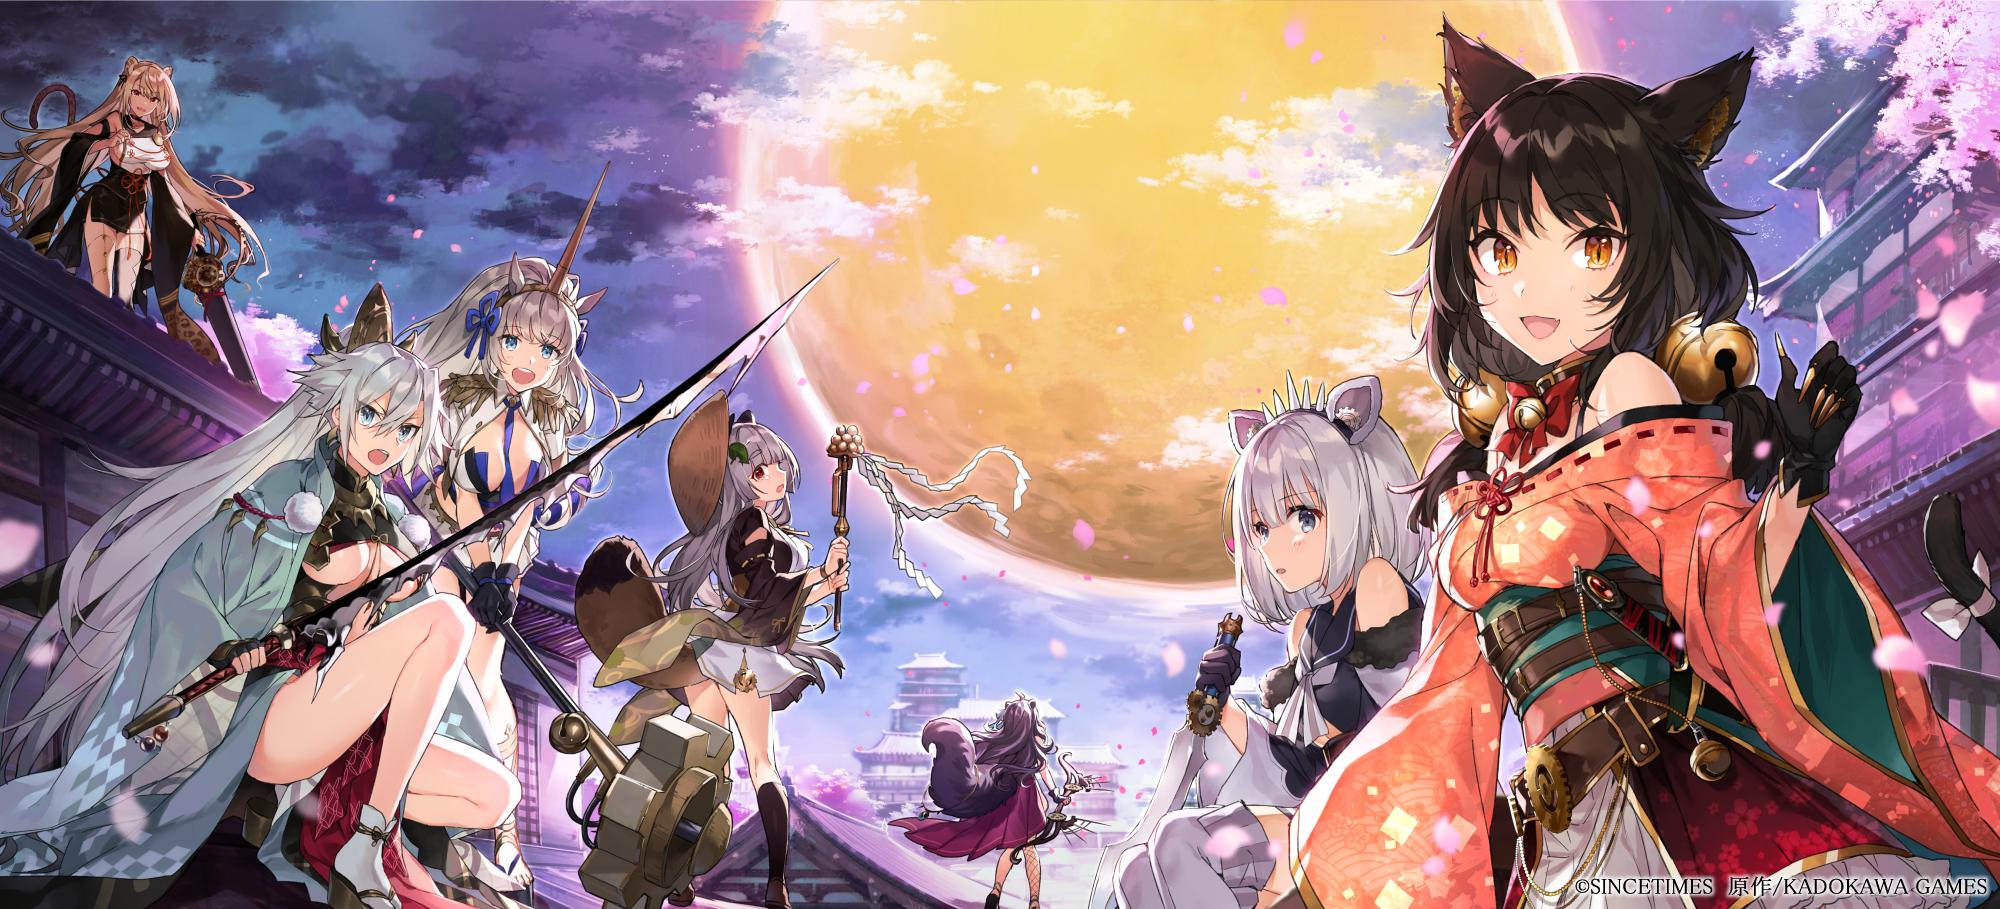 Anime 2000x909 original characters anime girls animal ears cat girl tail Moon sky weapon